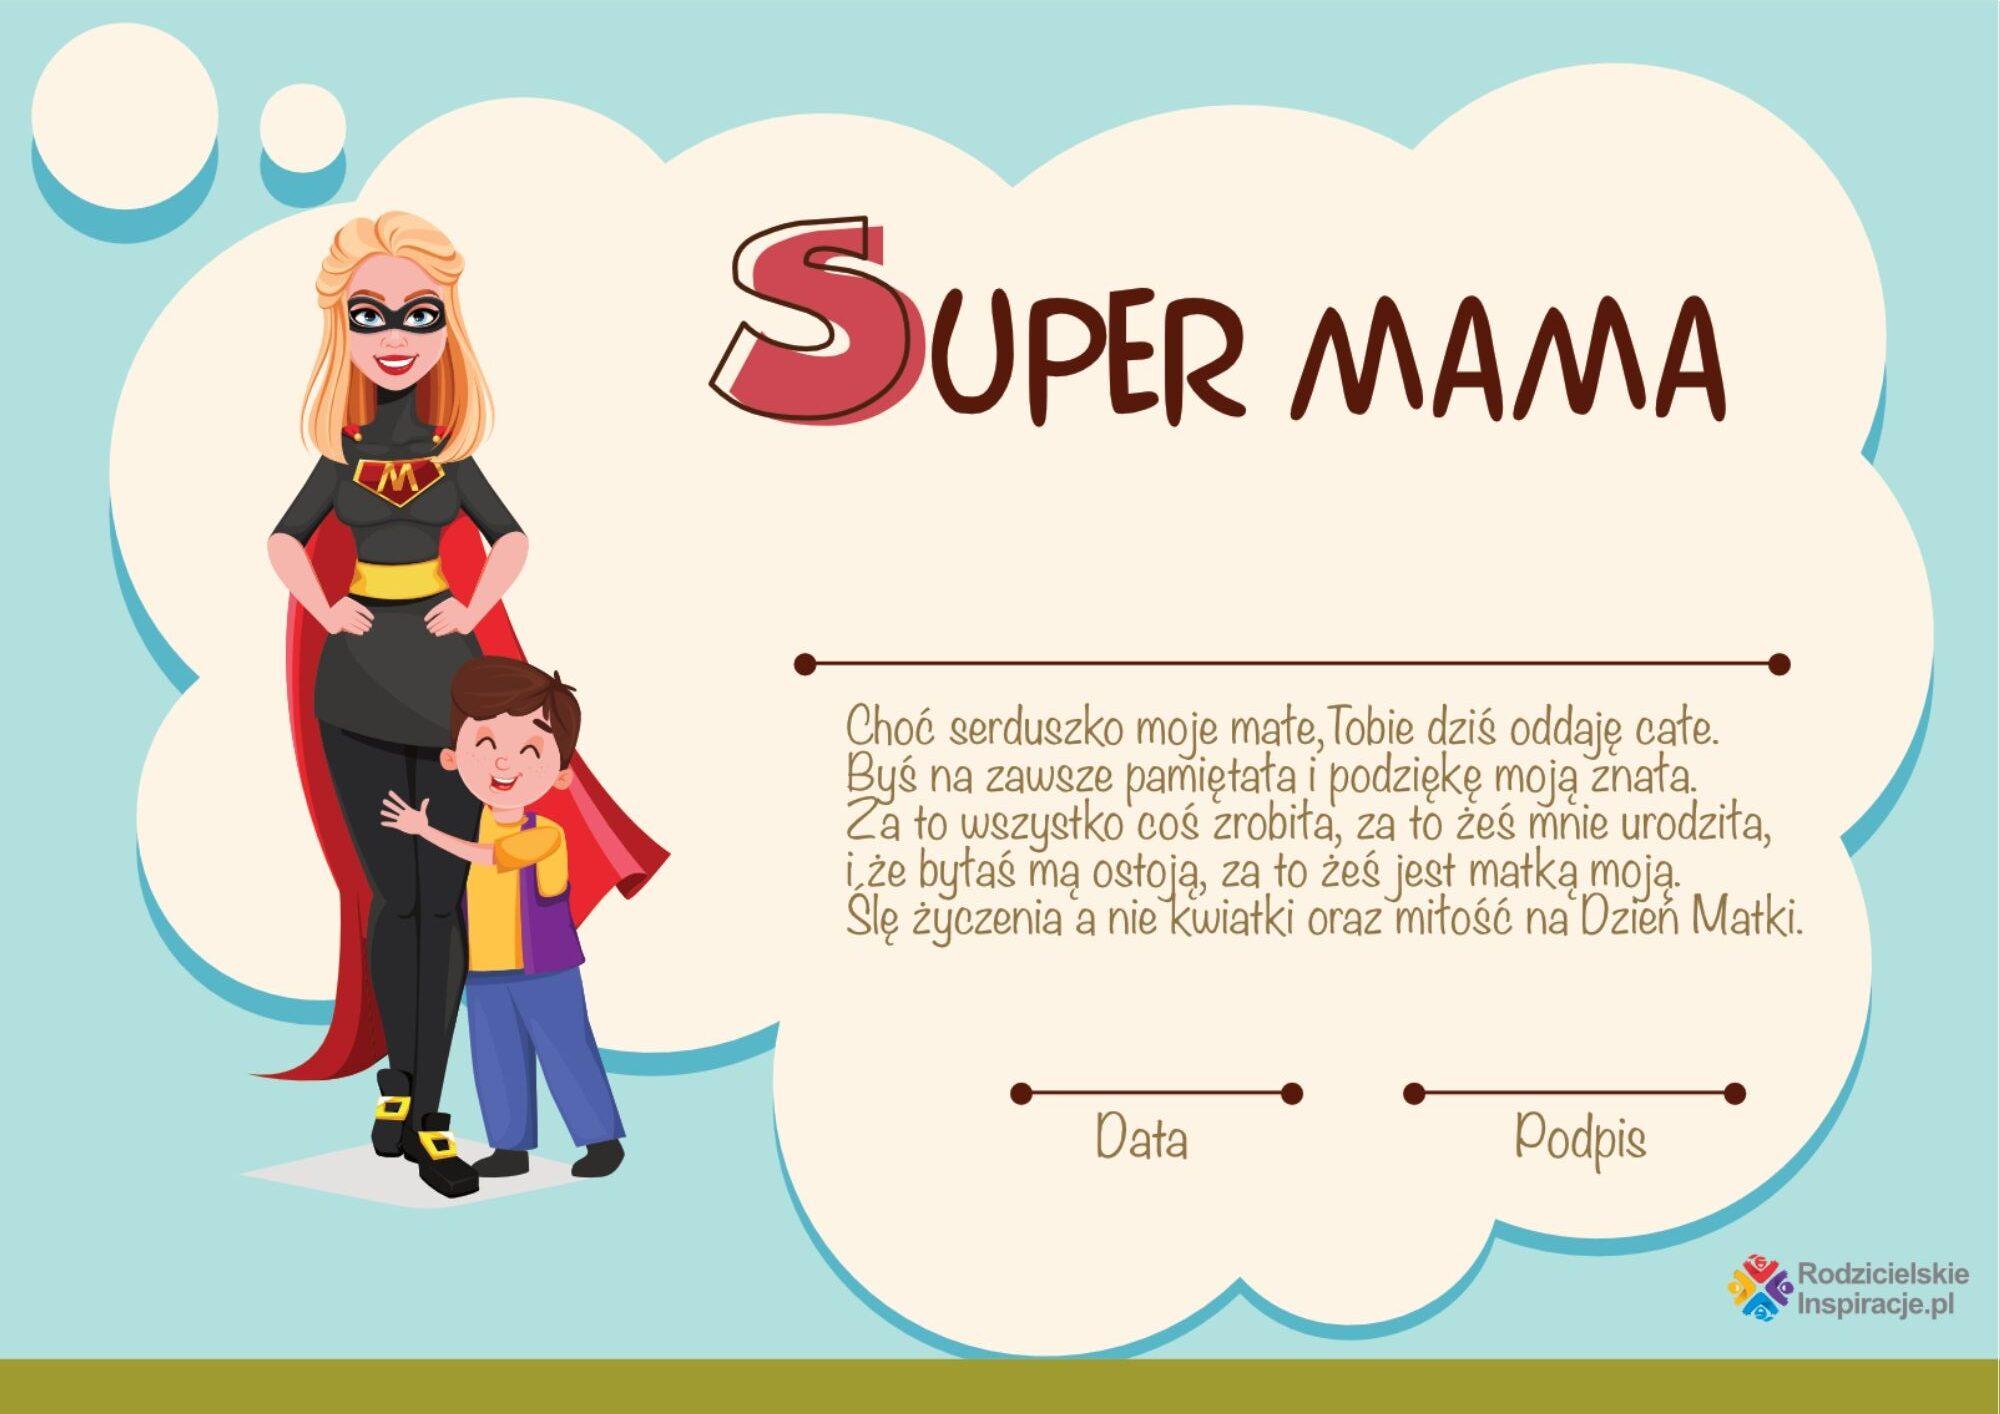 dyplom-dzien-mamy-super-mama